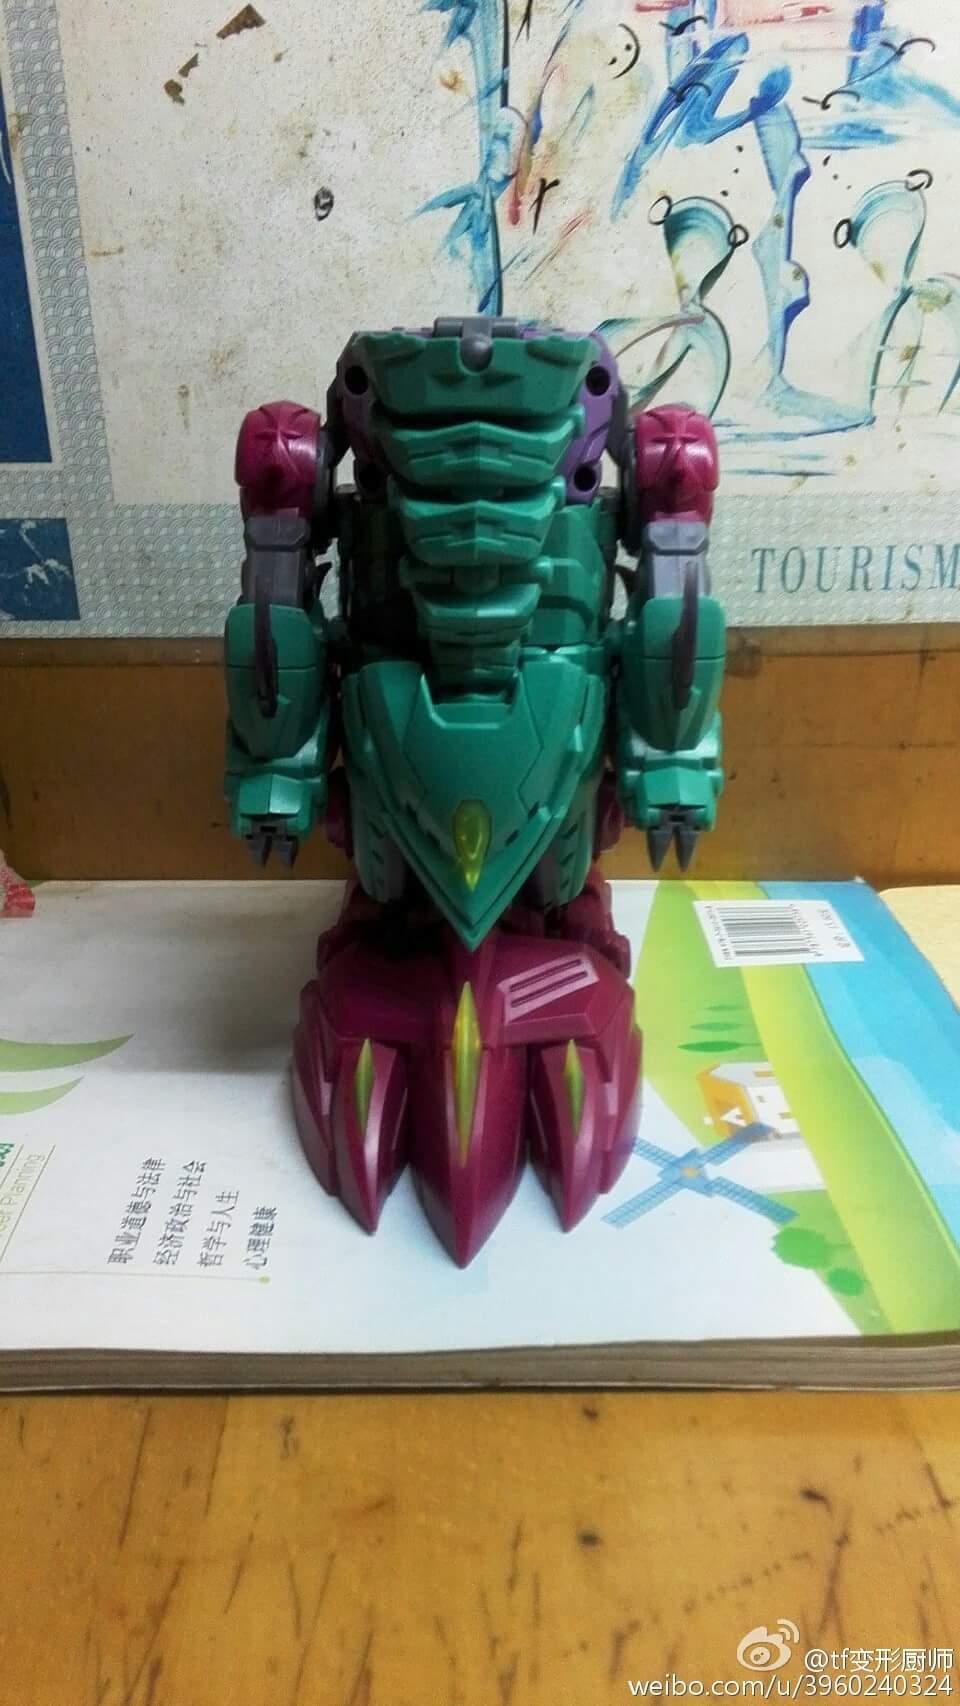 [TFC Toys] Produit Tiers - Jouet Poseidon - aka Piranacon/King Poseidon (TF Masterforce) - Page 3 Dh9Hi58P